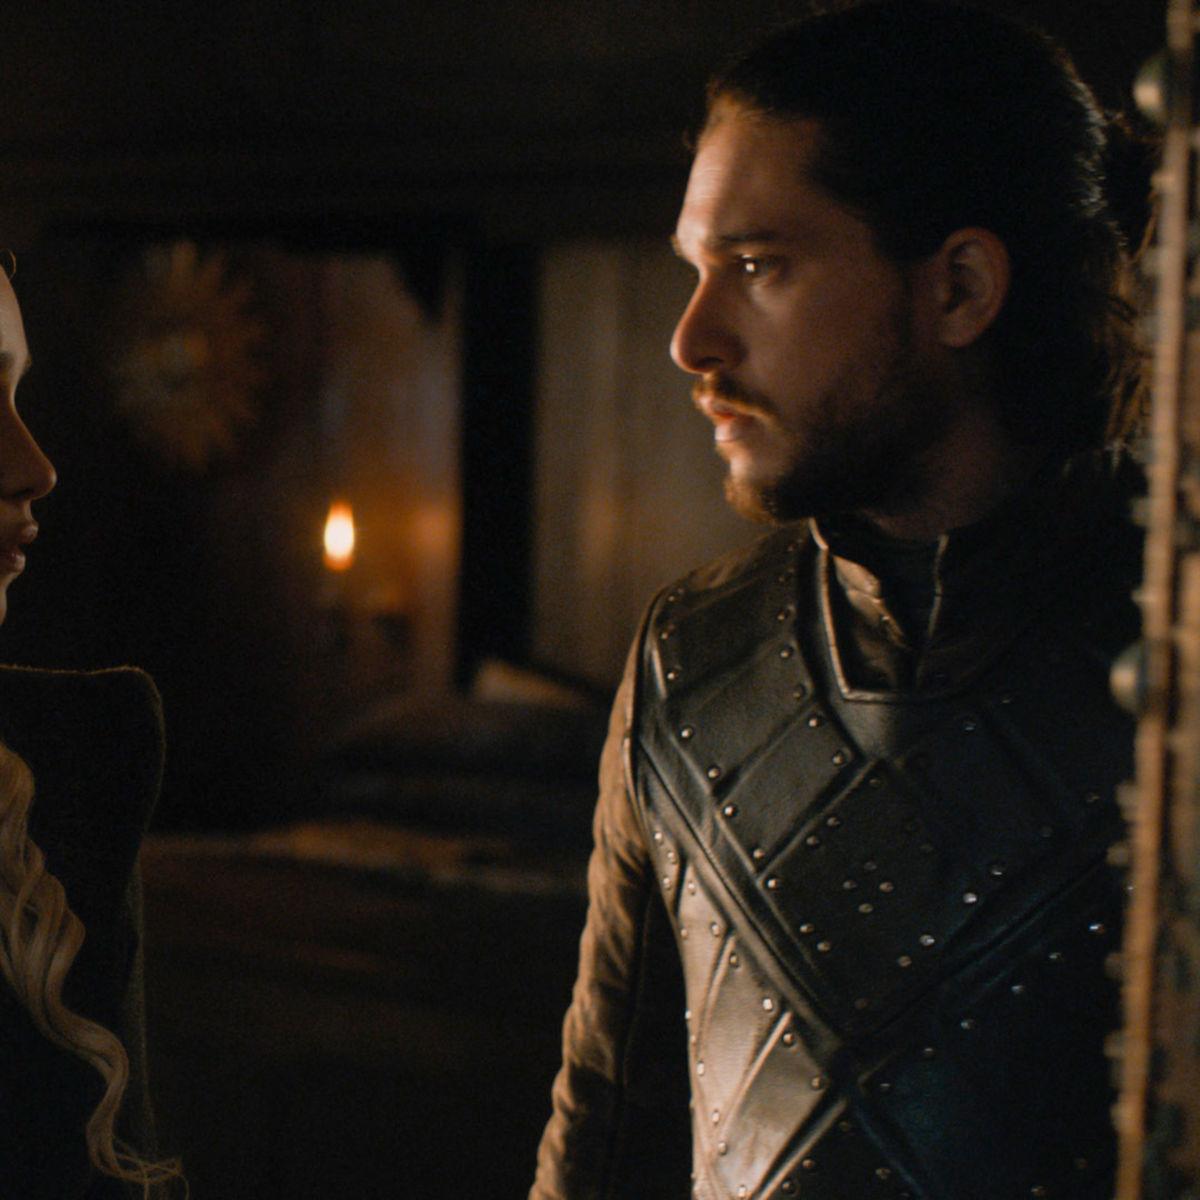 game_of_thrones_707_daenerys_jon_3733.jpg